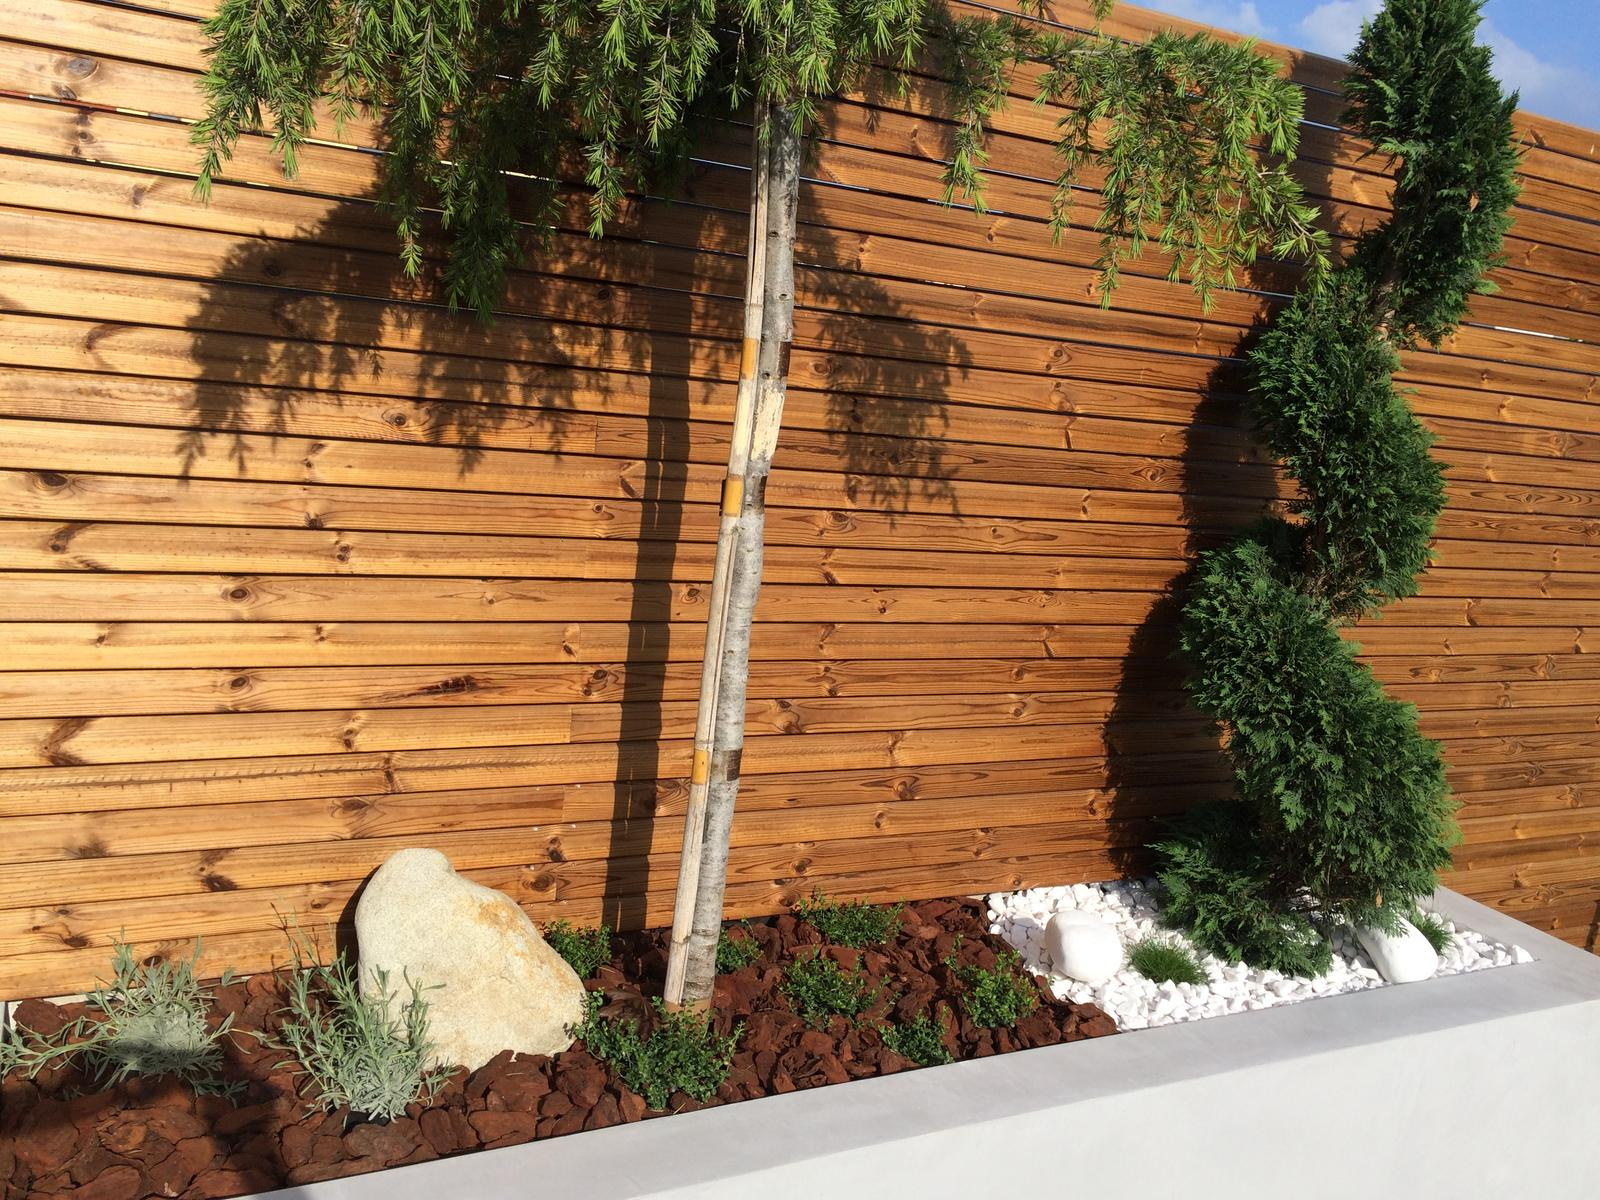 Zahradka - Obrázok č. 54